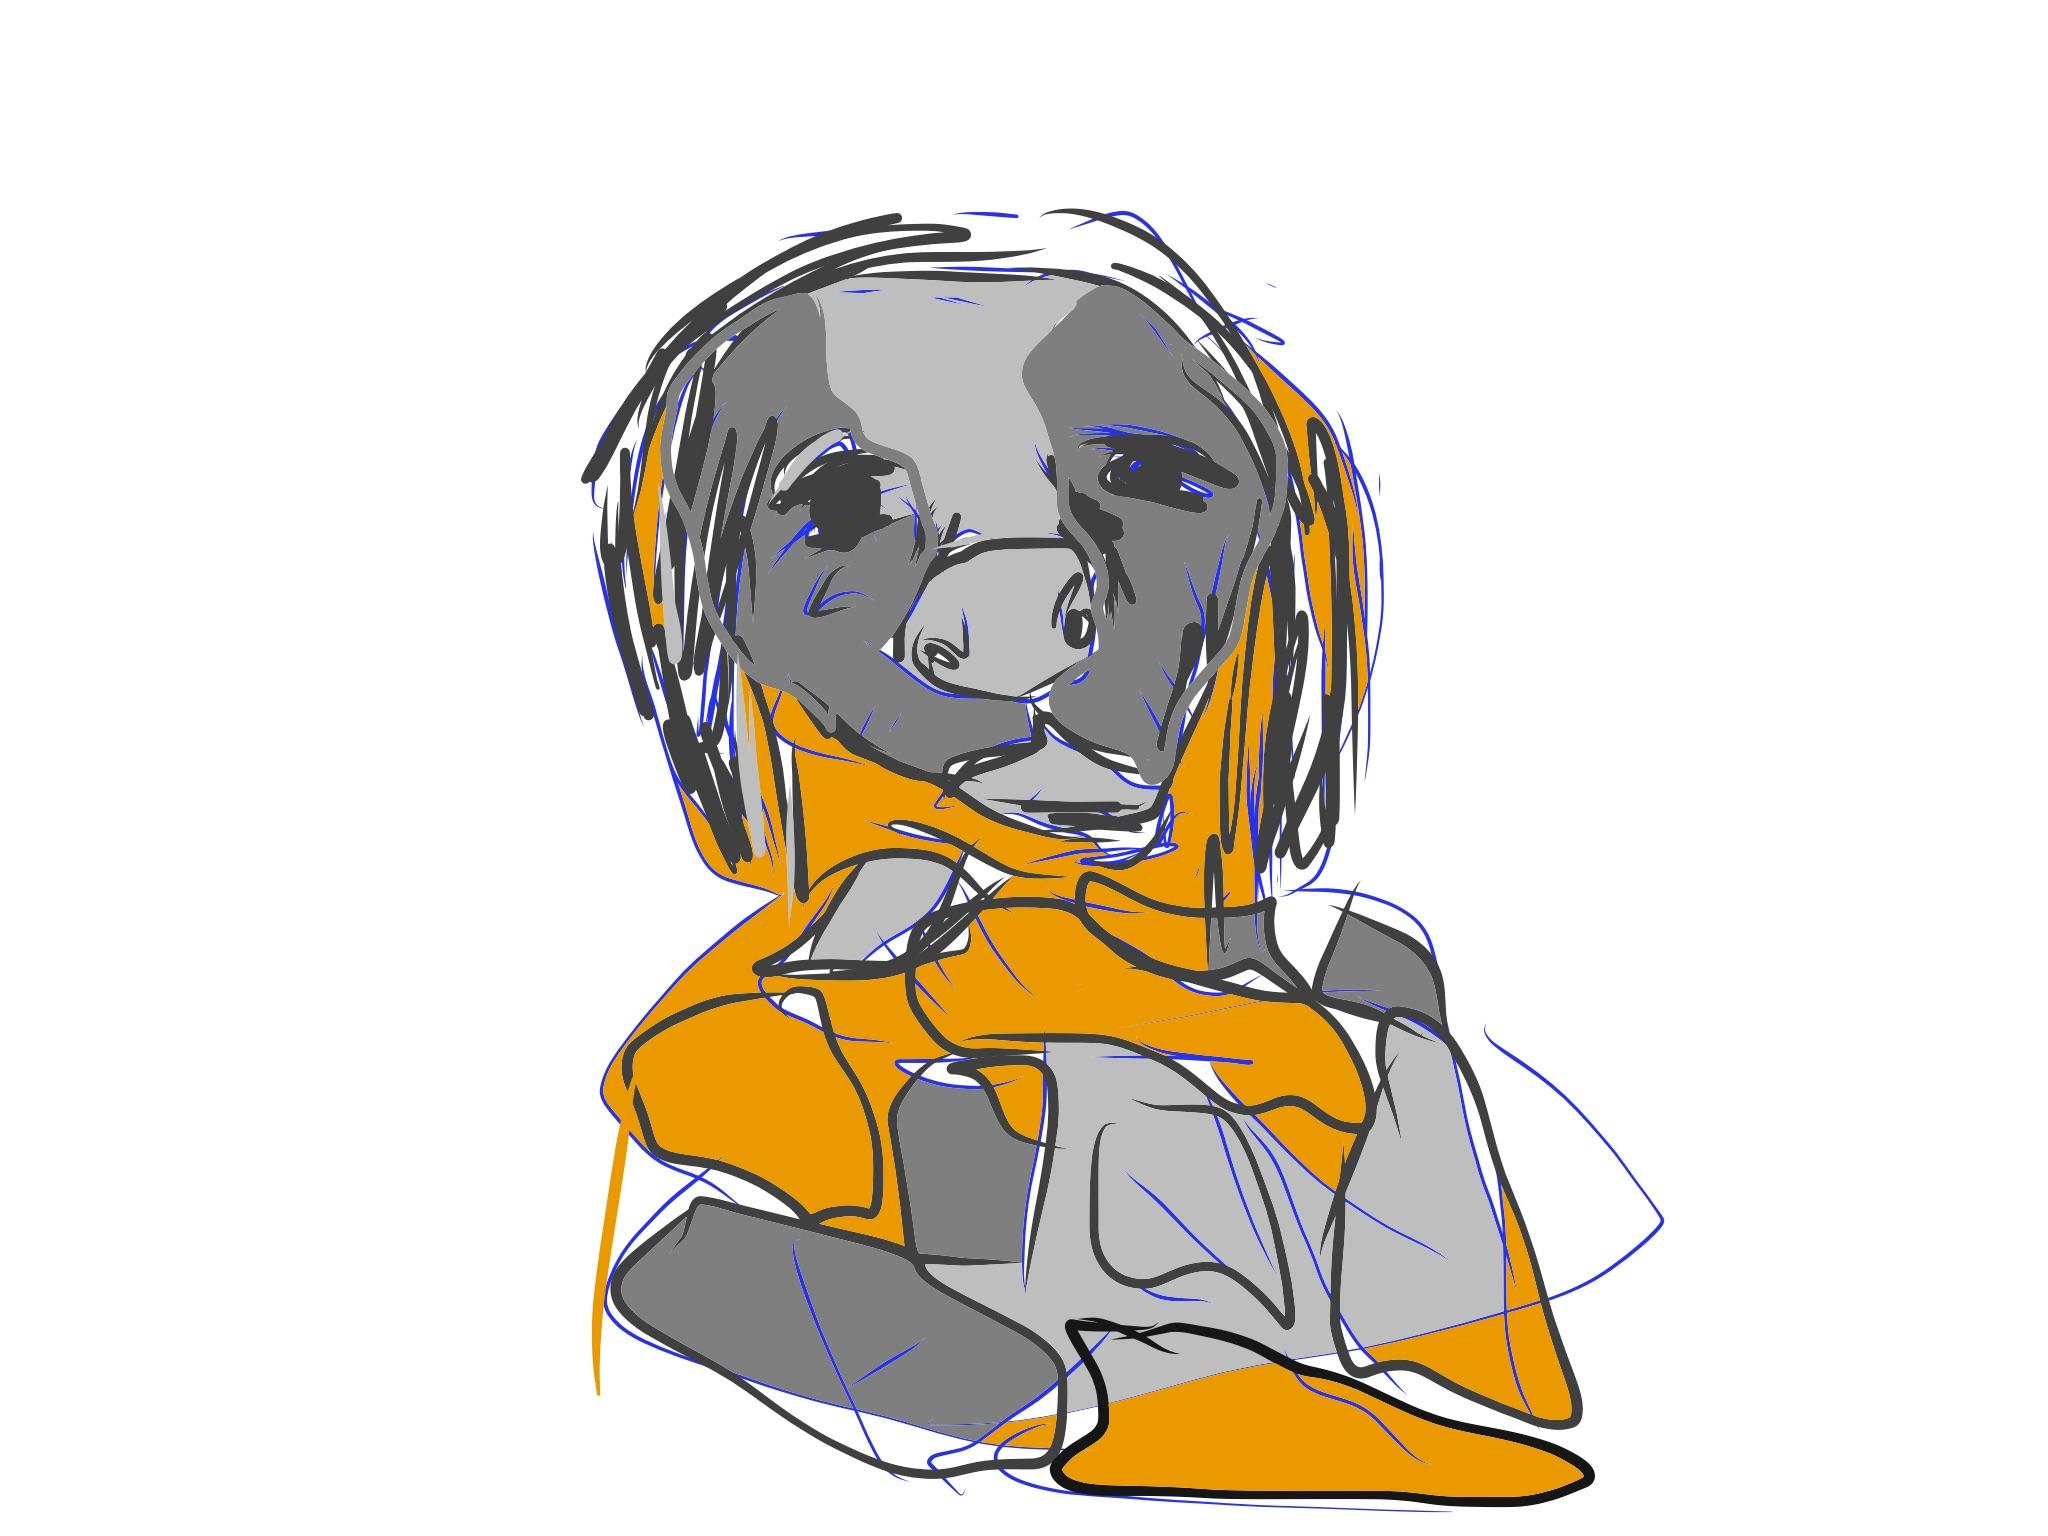 Image-1 (18).jpg